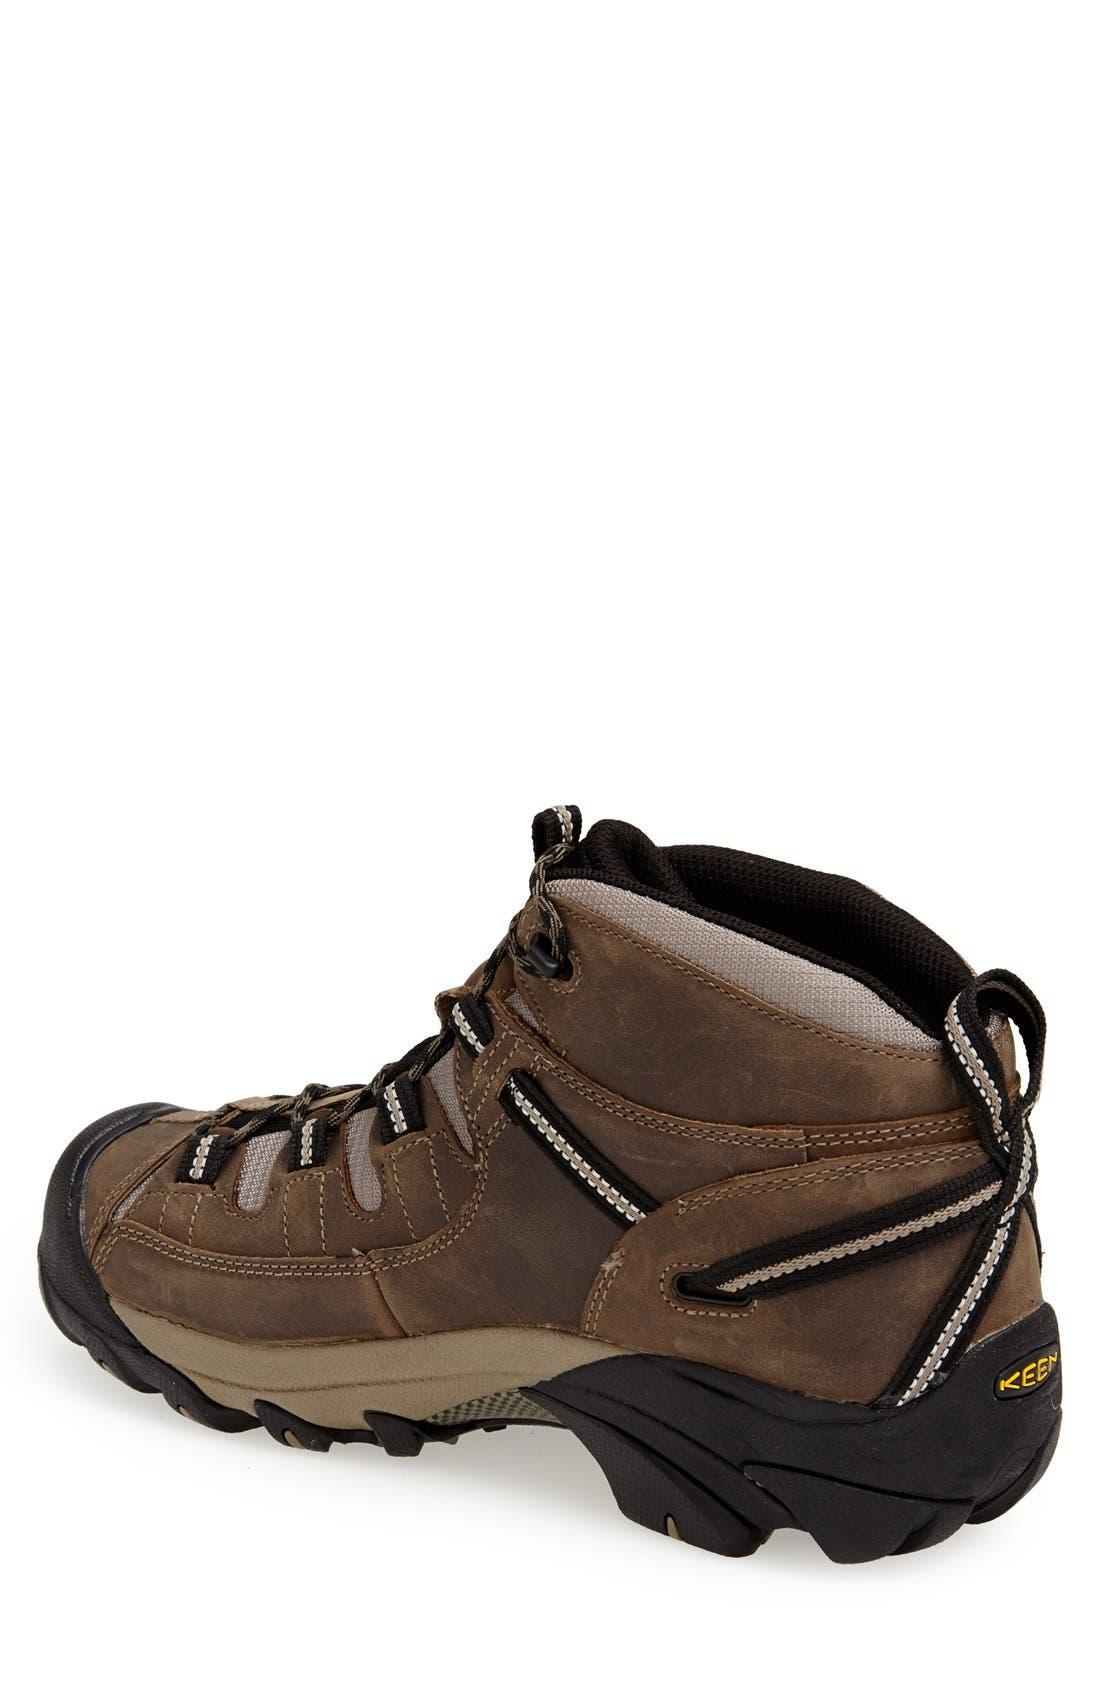 Alternate Image 2  - Keen 'Targhee II Mid' Hiking Boot (Men)